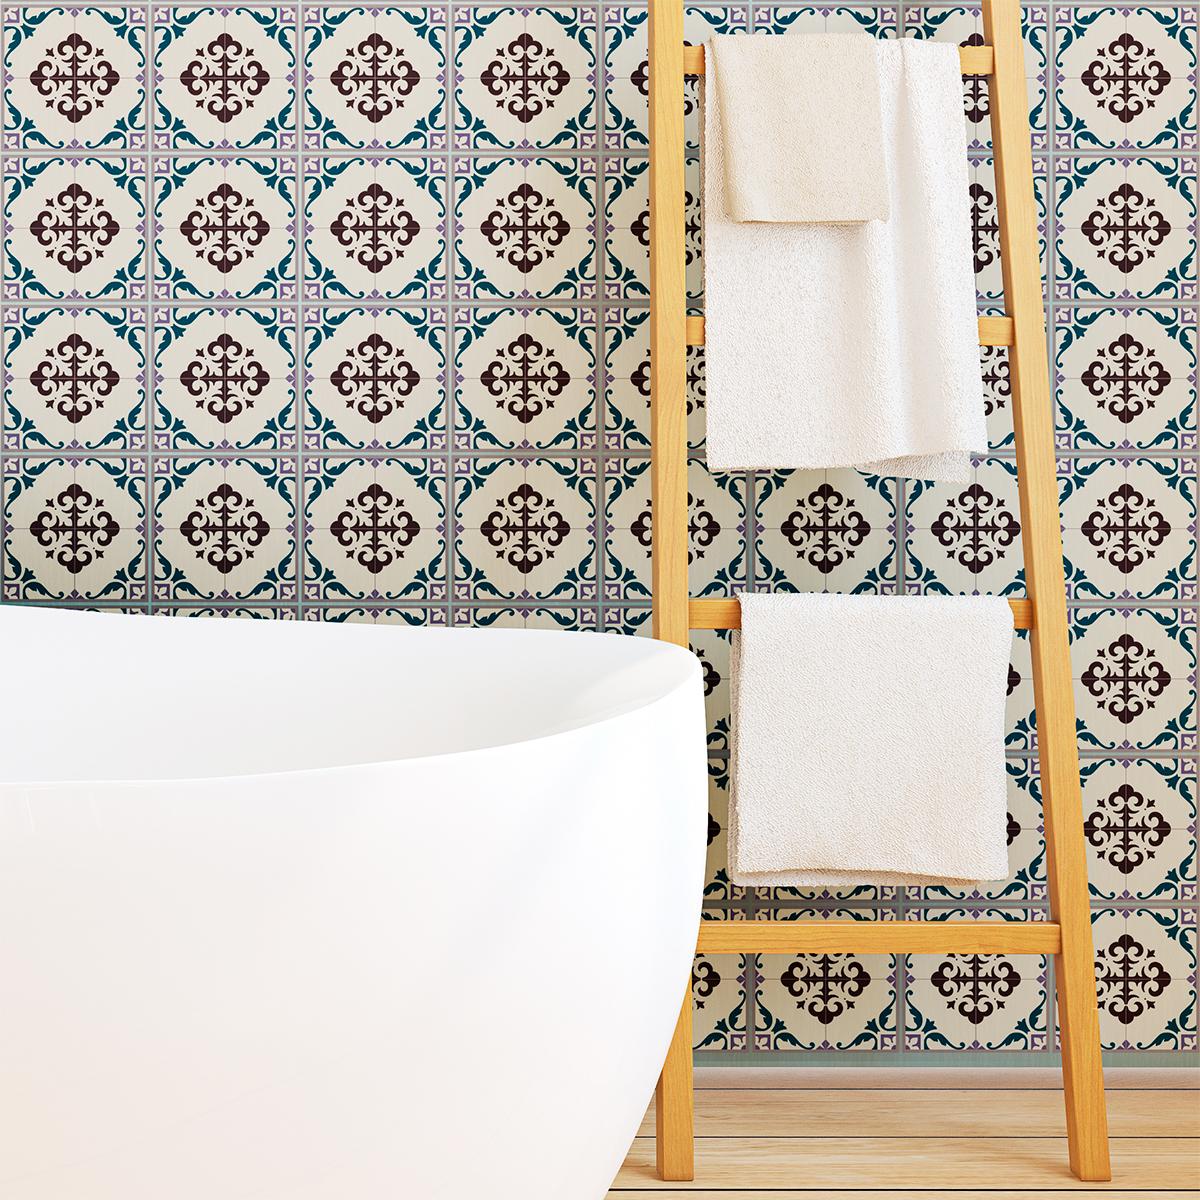 60 stickers carreaux de ciment azulejos gergeli cuisine. Black Bedroom Furniture Sets. Home Design Ideas